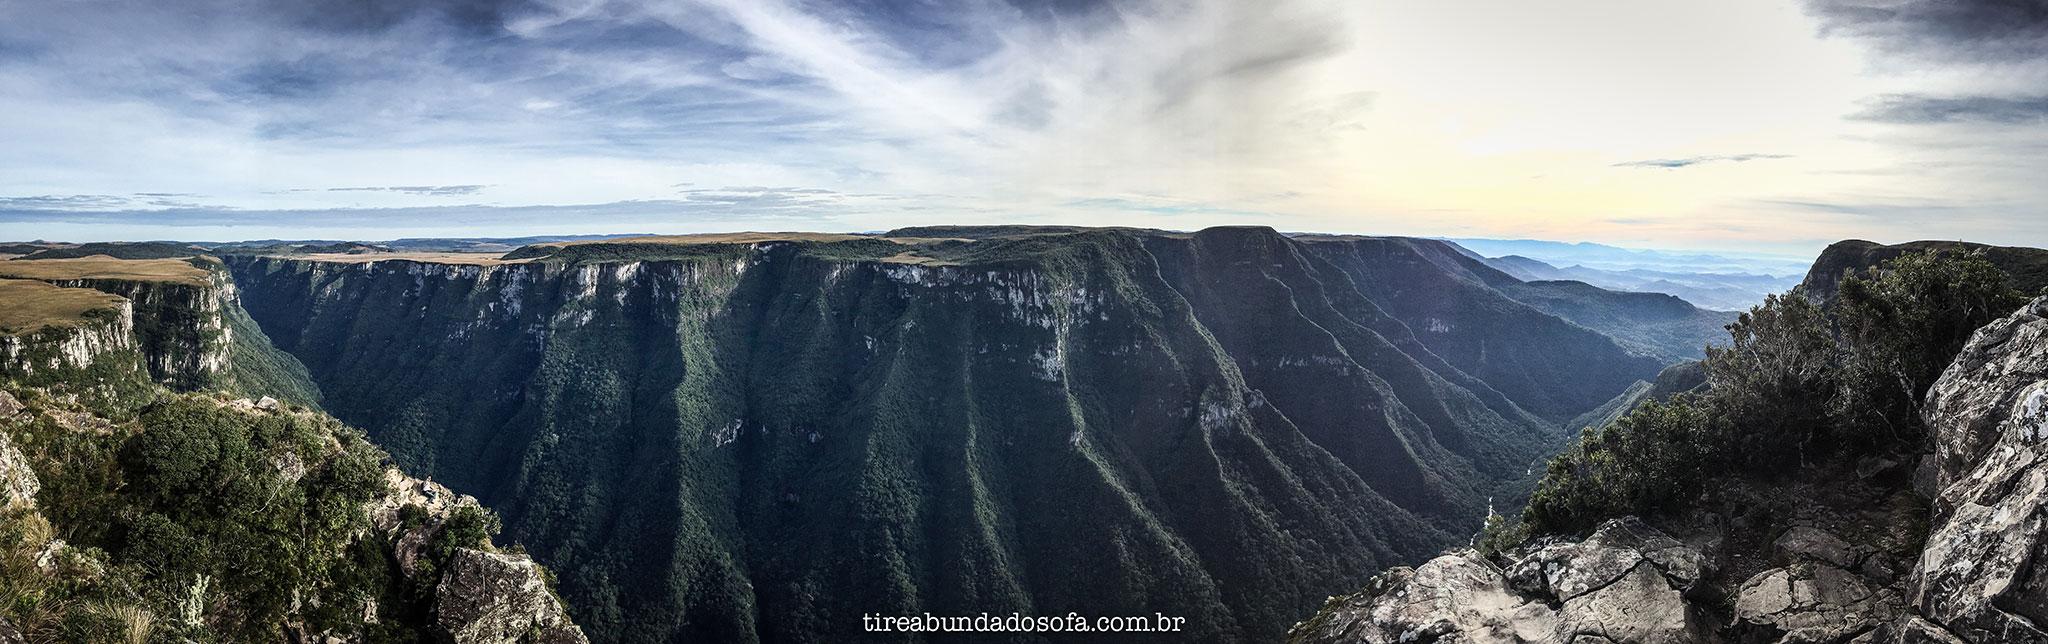 cânion fortaleza, parque nacional da serra geral, cambará do sul, rio grande do sul